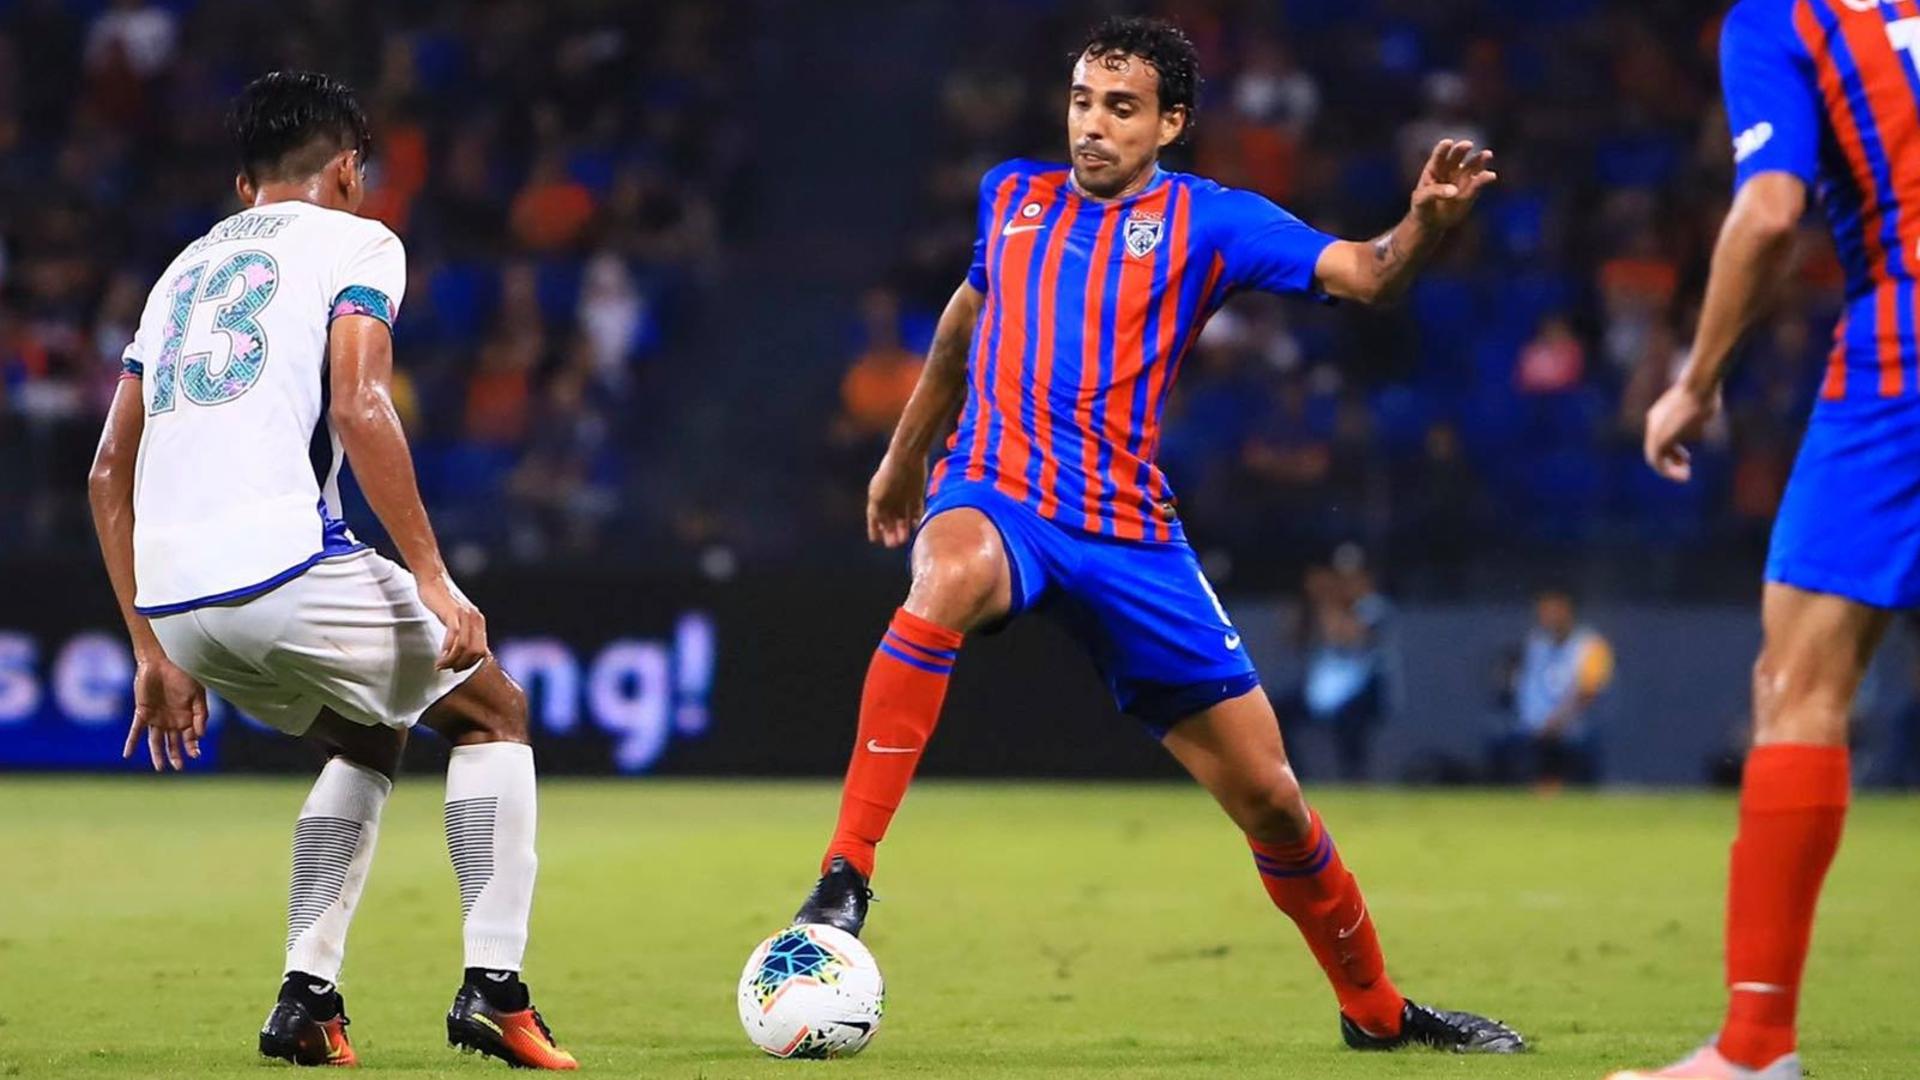 Diogo Luis Santo, Johor Darul Ta'zim v UiTM FC, Super League, 7 Mar 2020